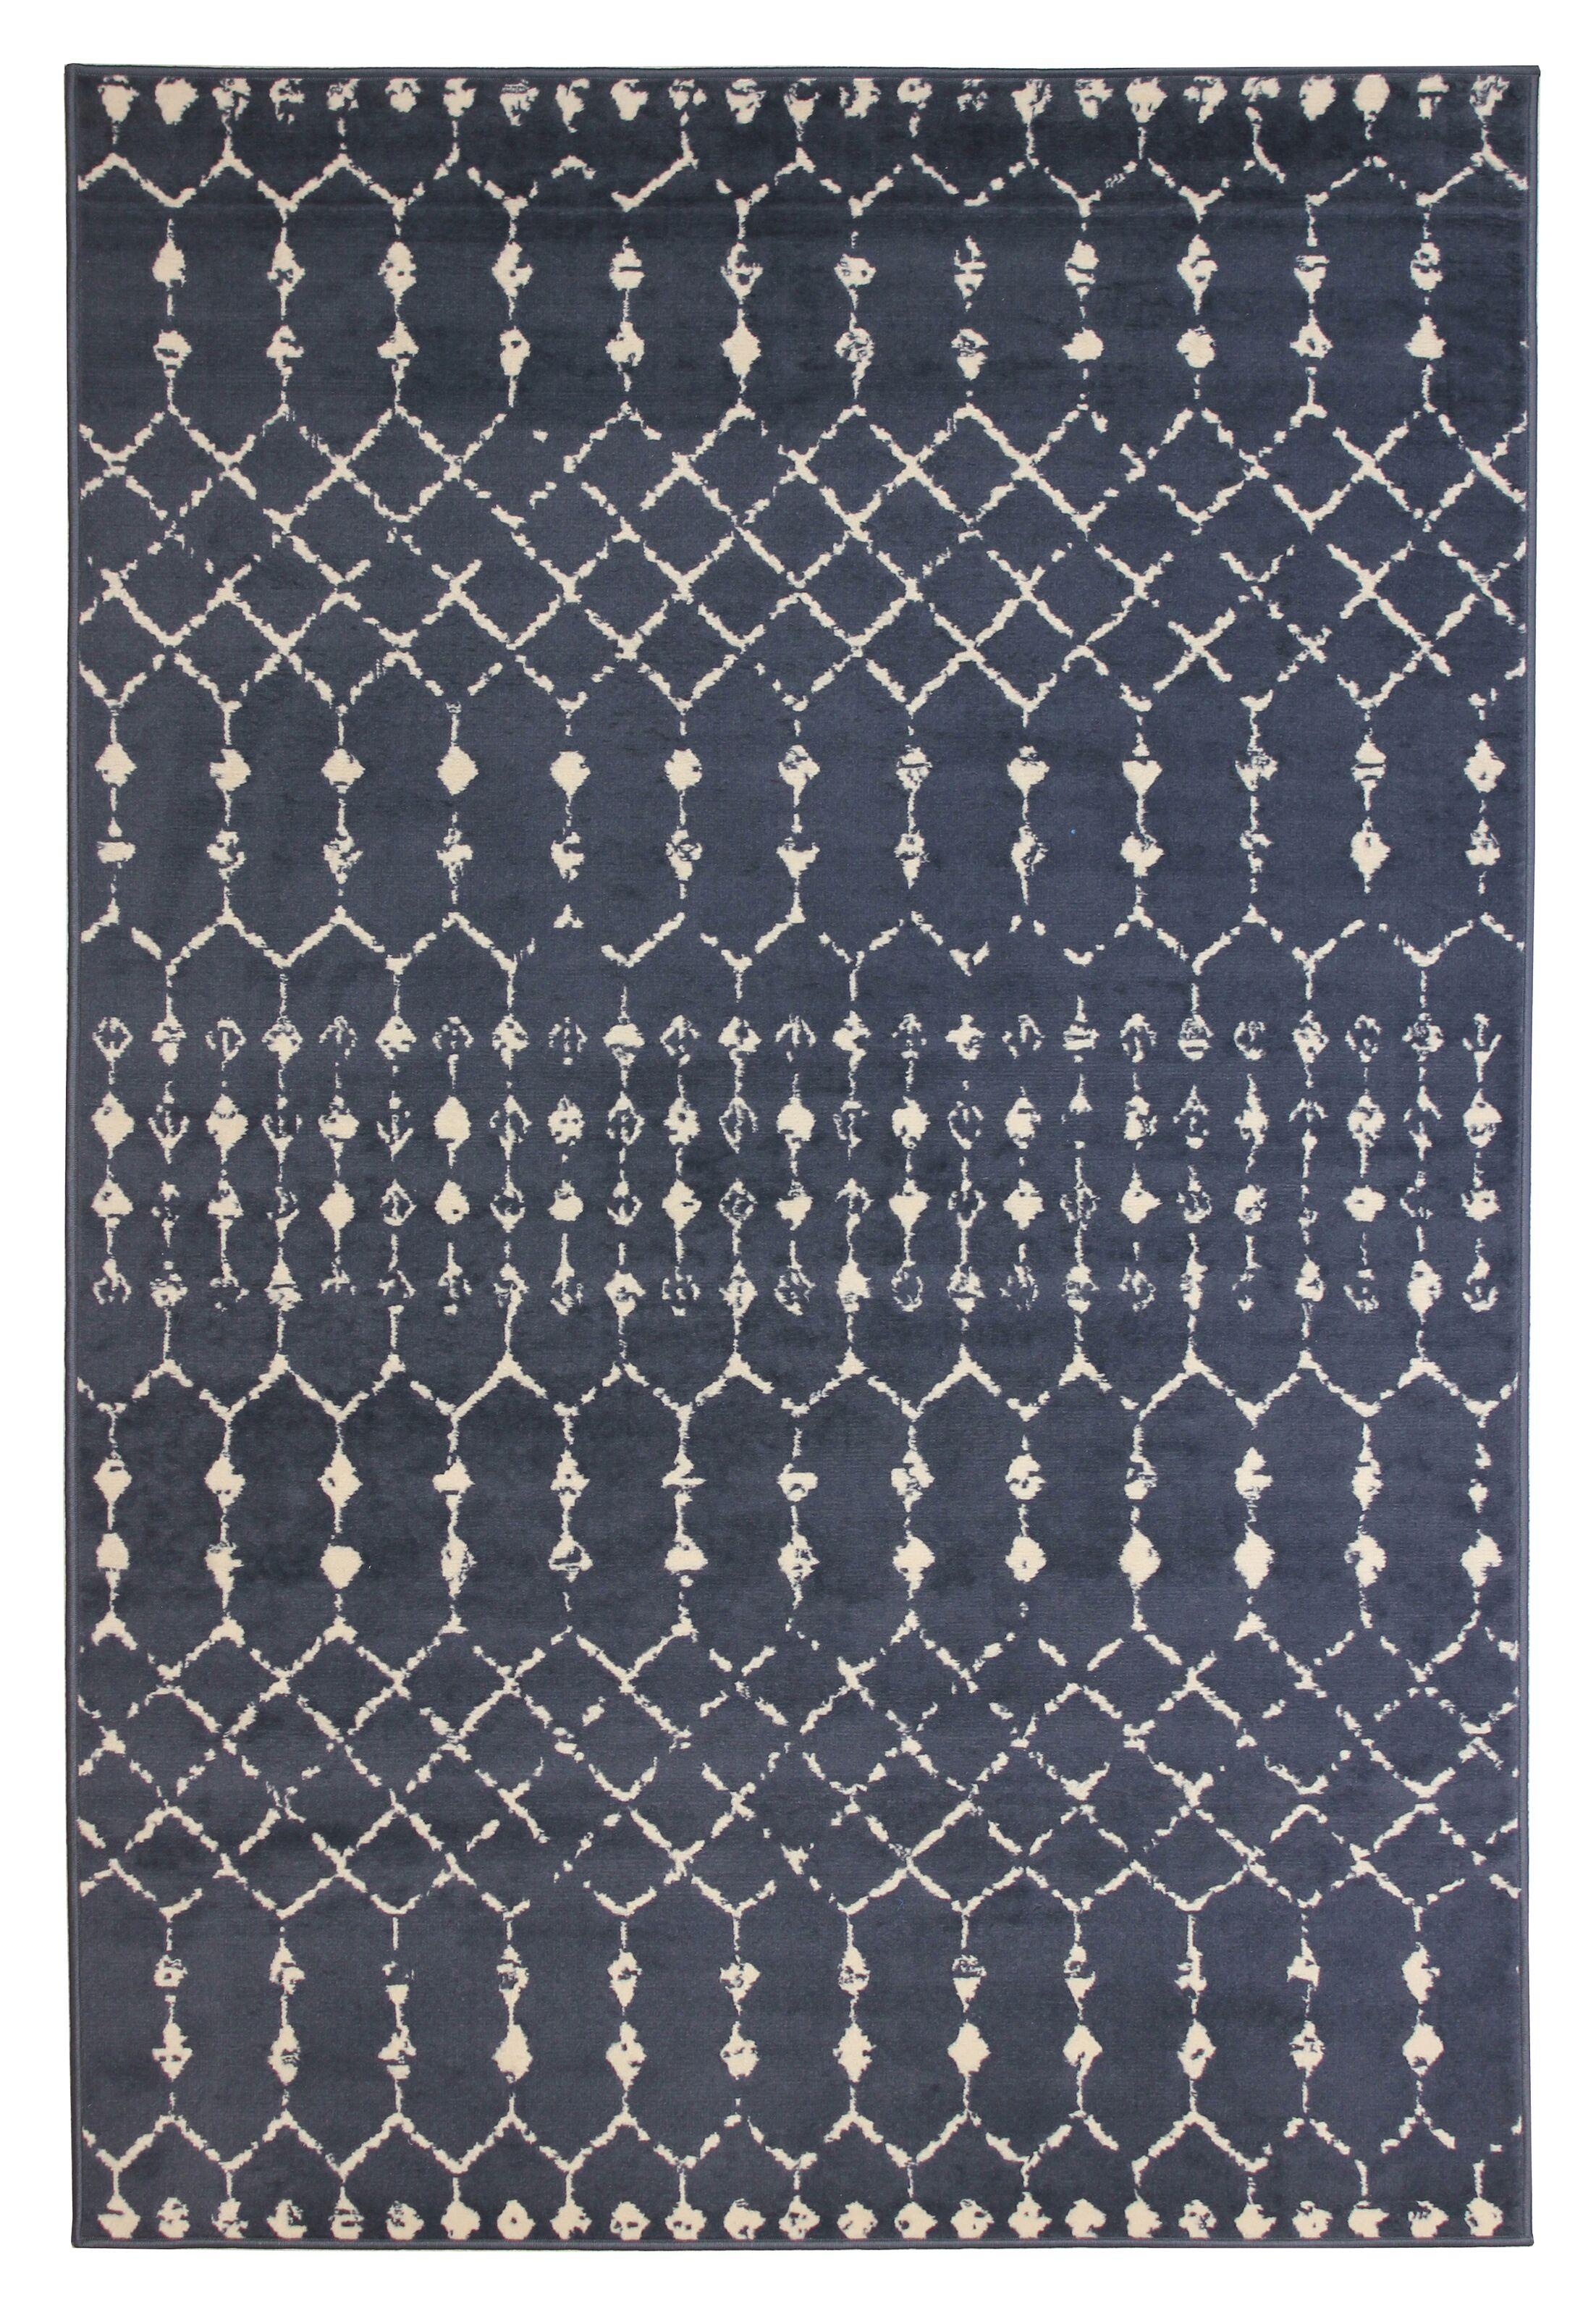 Melton Gray Area Rug Rug Size: Rectangle 8' x 10'